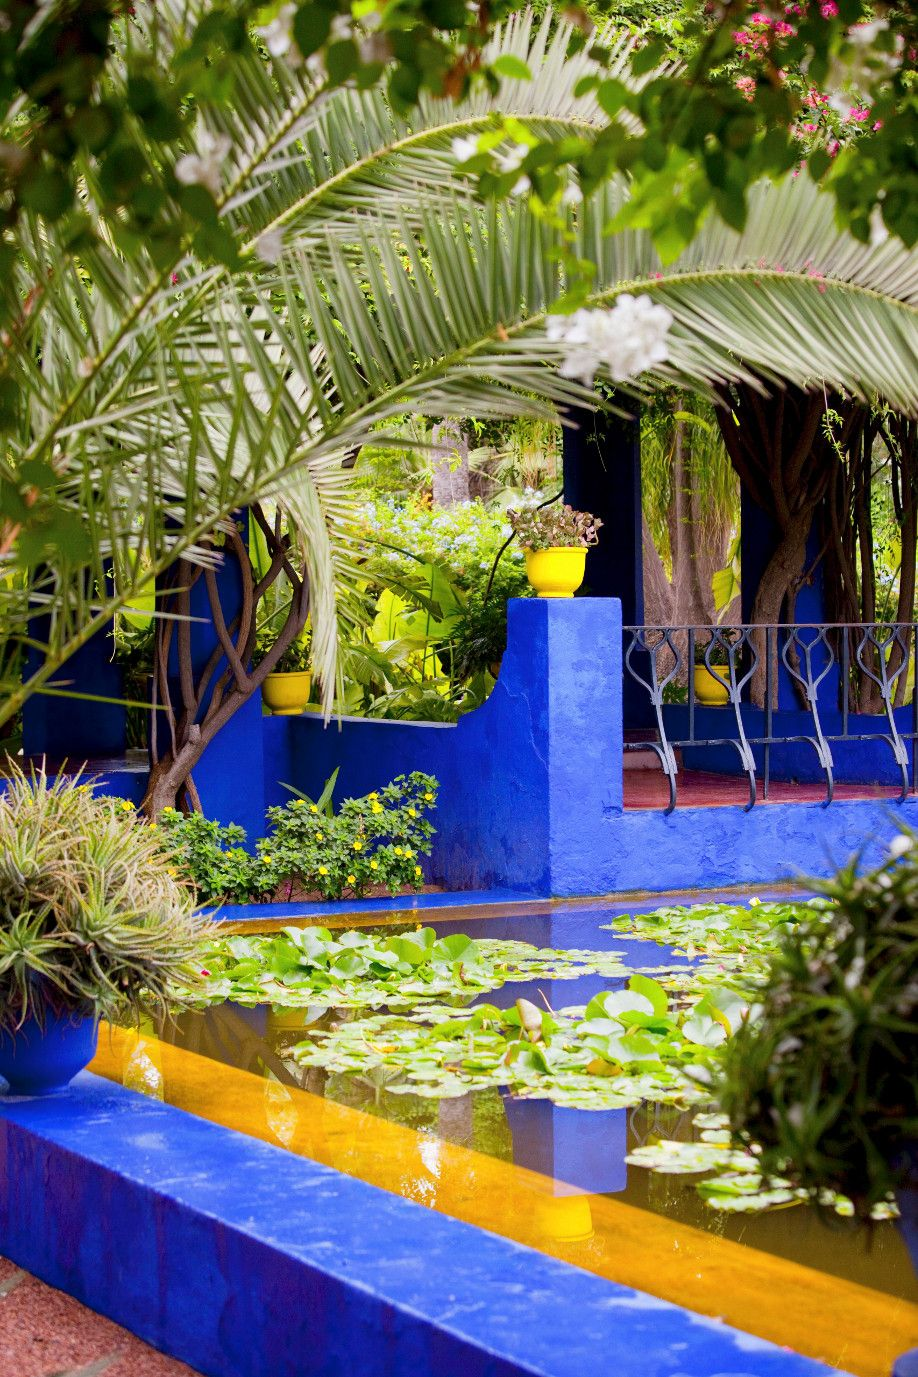 Le jardin majorelle le jardin bleu de marrakech jardin - Jardin majorelle prix d entree ...